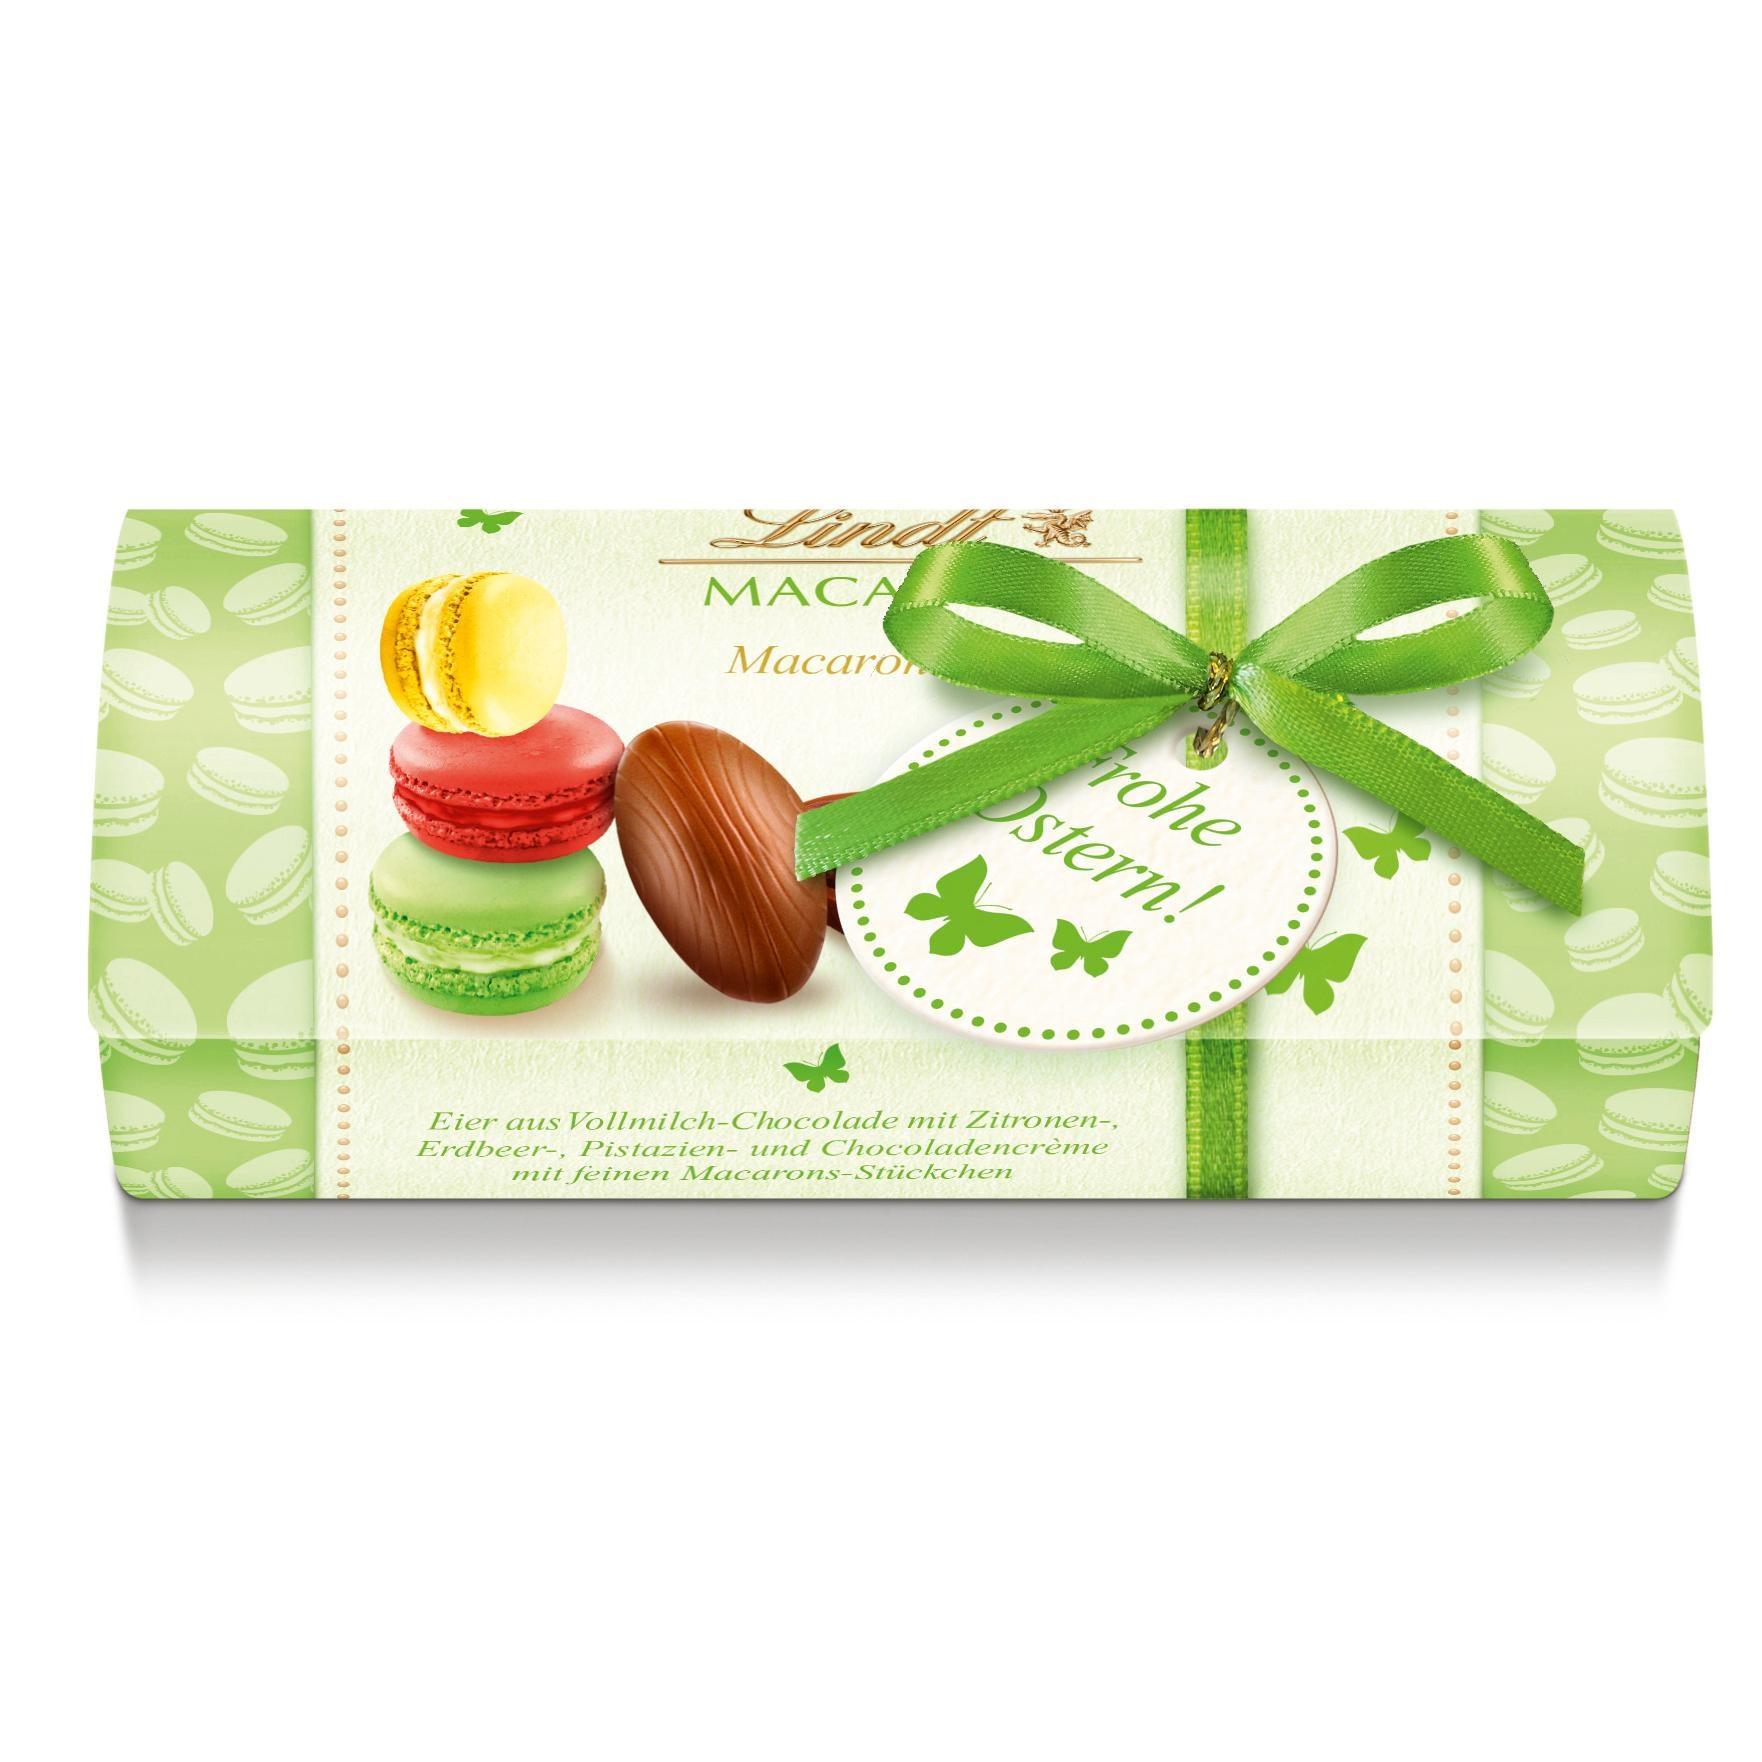 Lindt Macarons-Eier kleines Geschenk Pralinen 40g